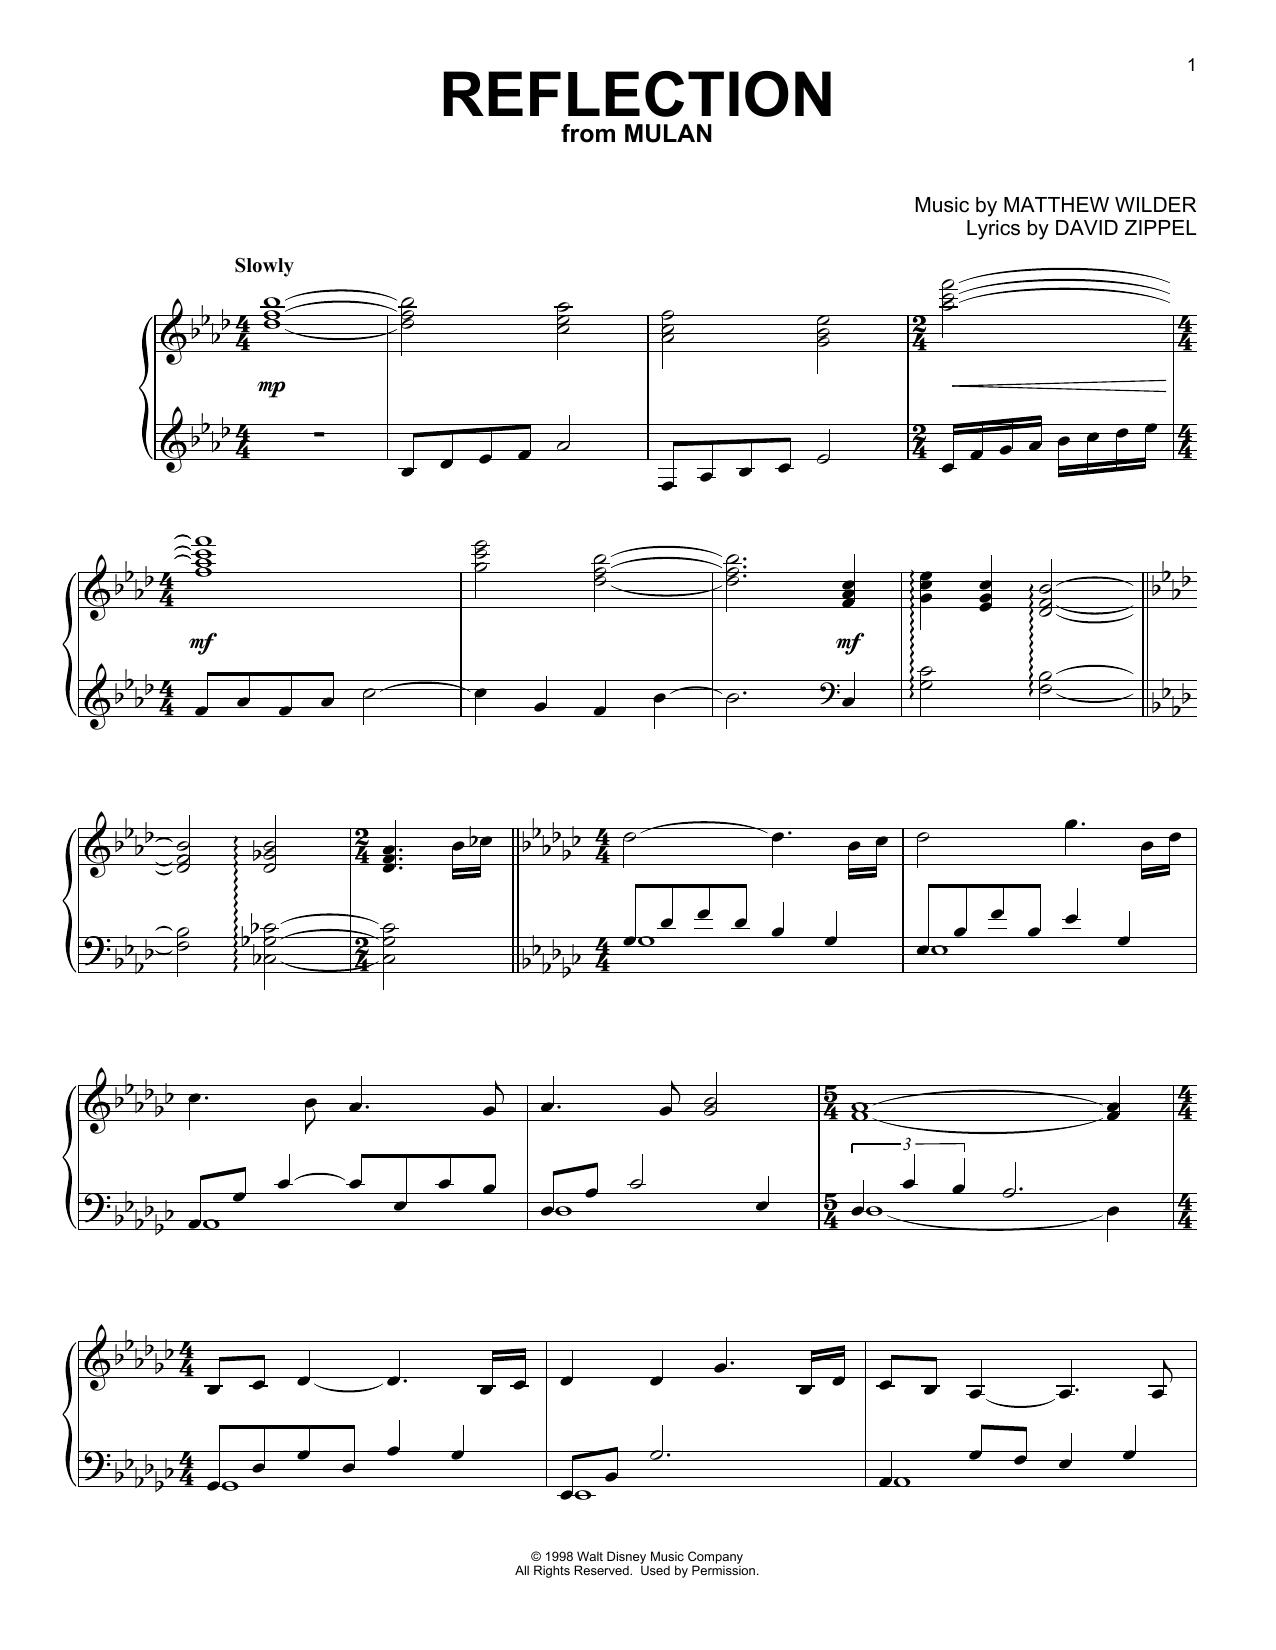 Matthew Wilder Reflection (from Mulan) sheet music notes and chords